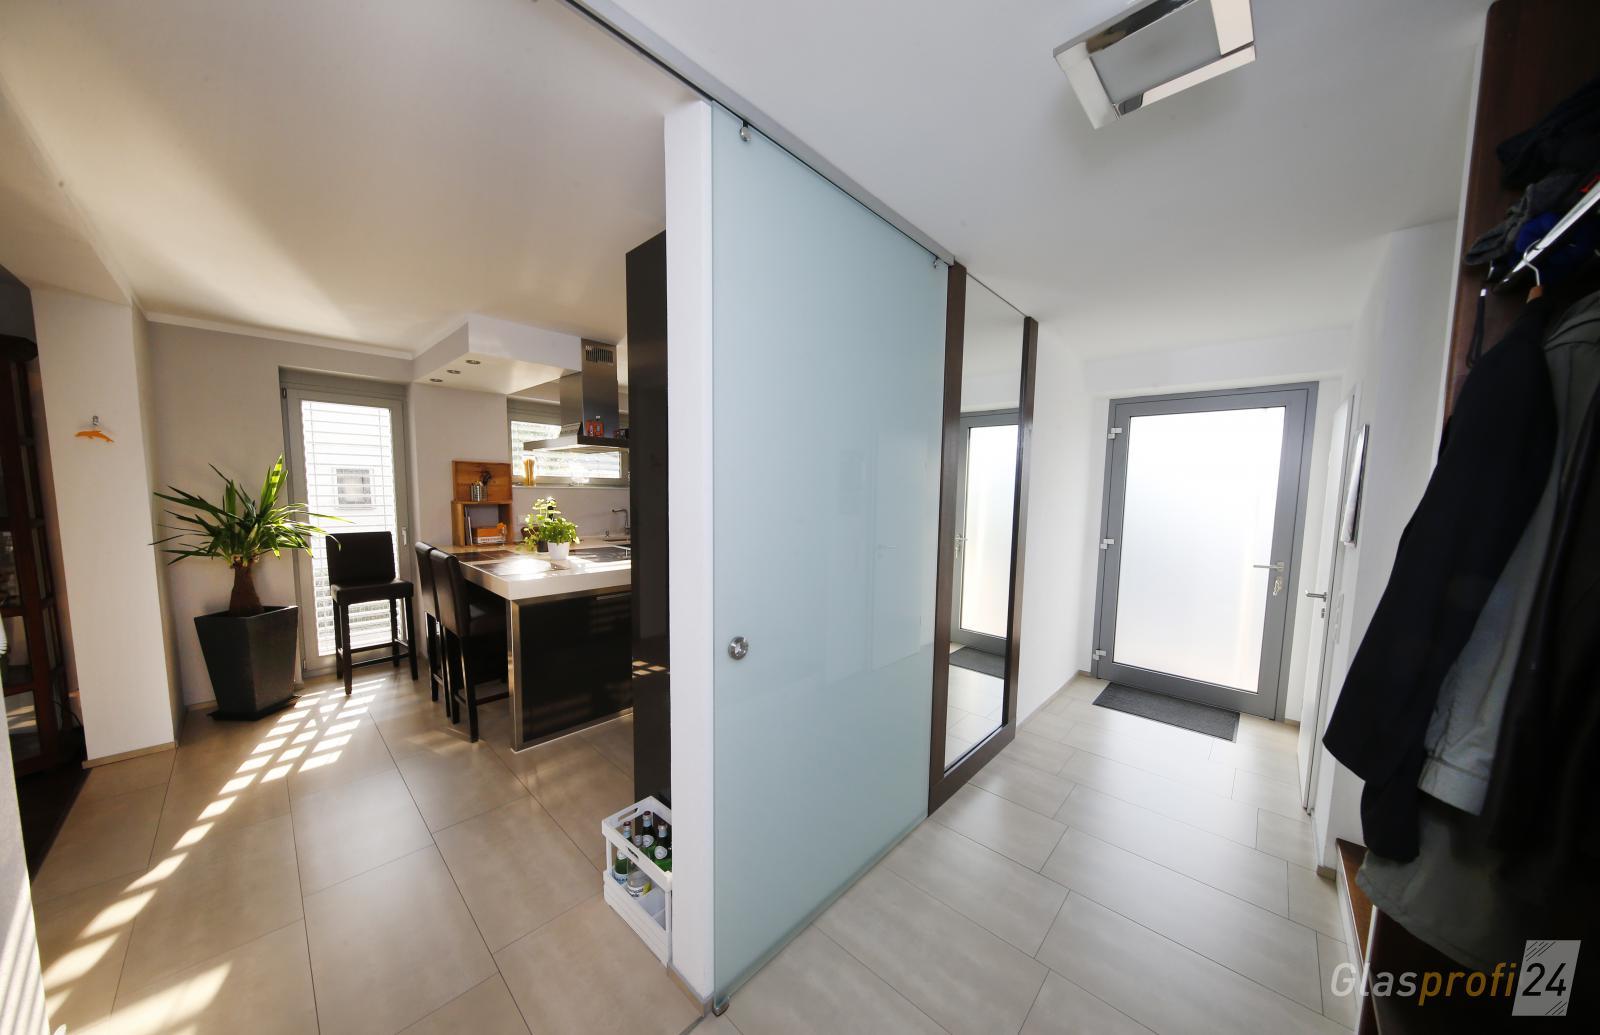 glasschiebet r mit alu beschlag glasprofi24. Black Bedroom Furniture Sets. Home Design Ideas